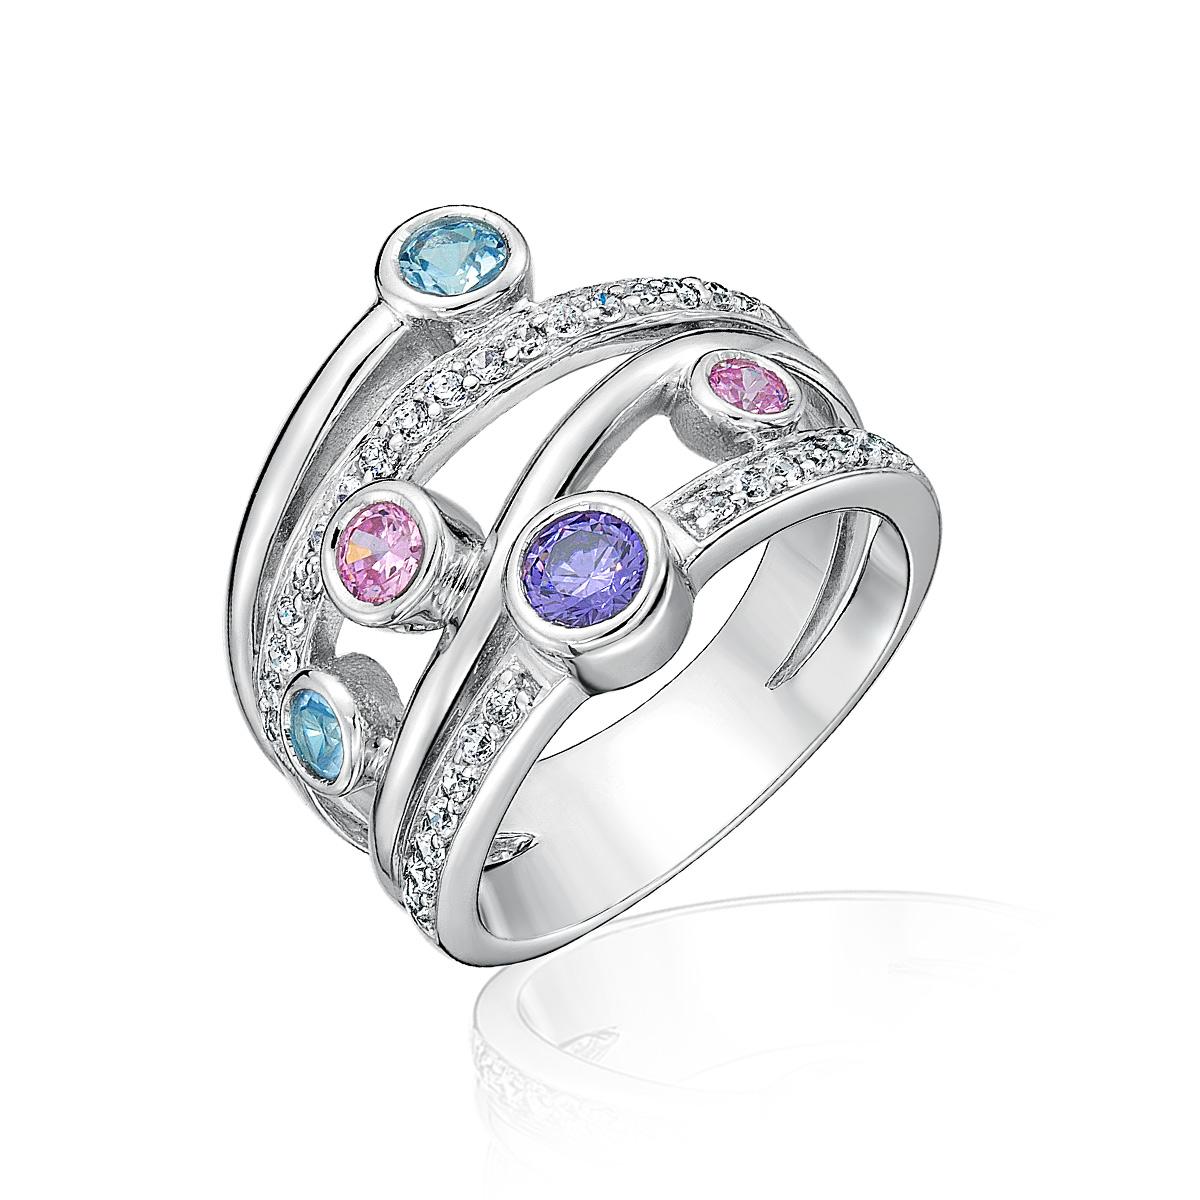 KSW207 彩色遊樂園璀鑽首飾戒指